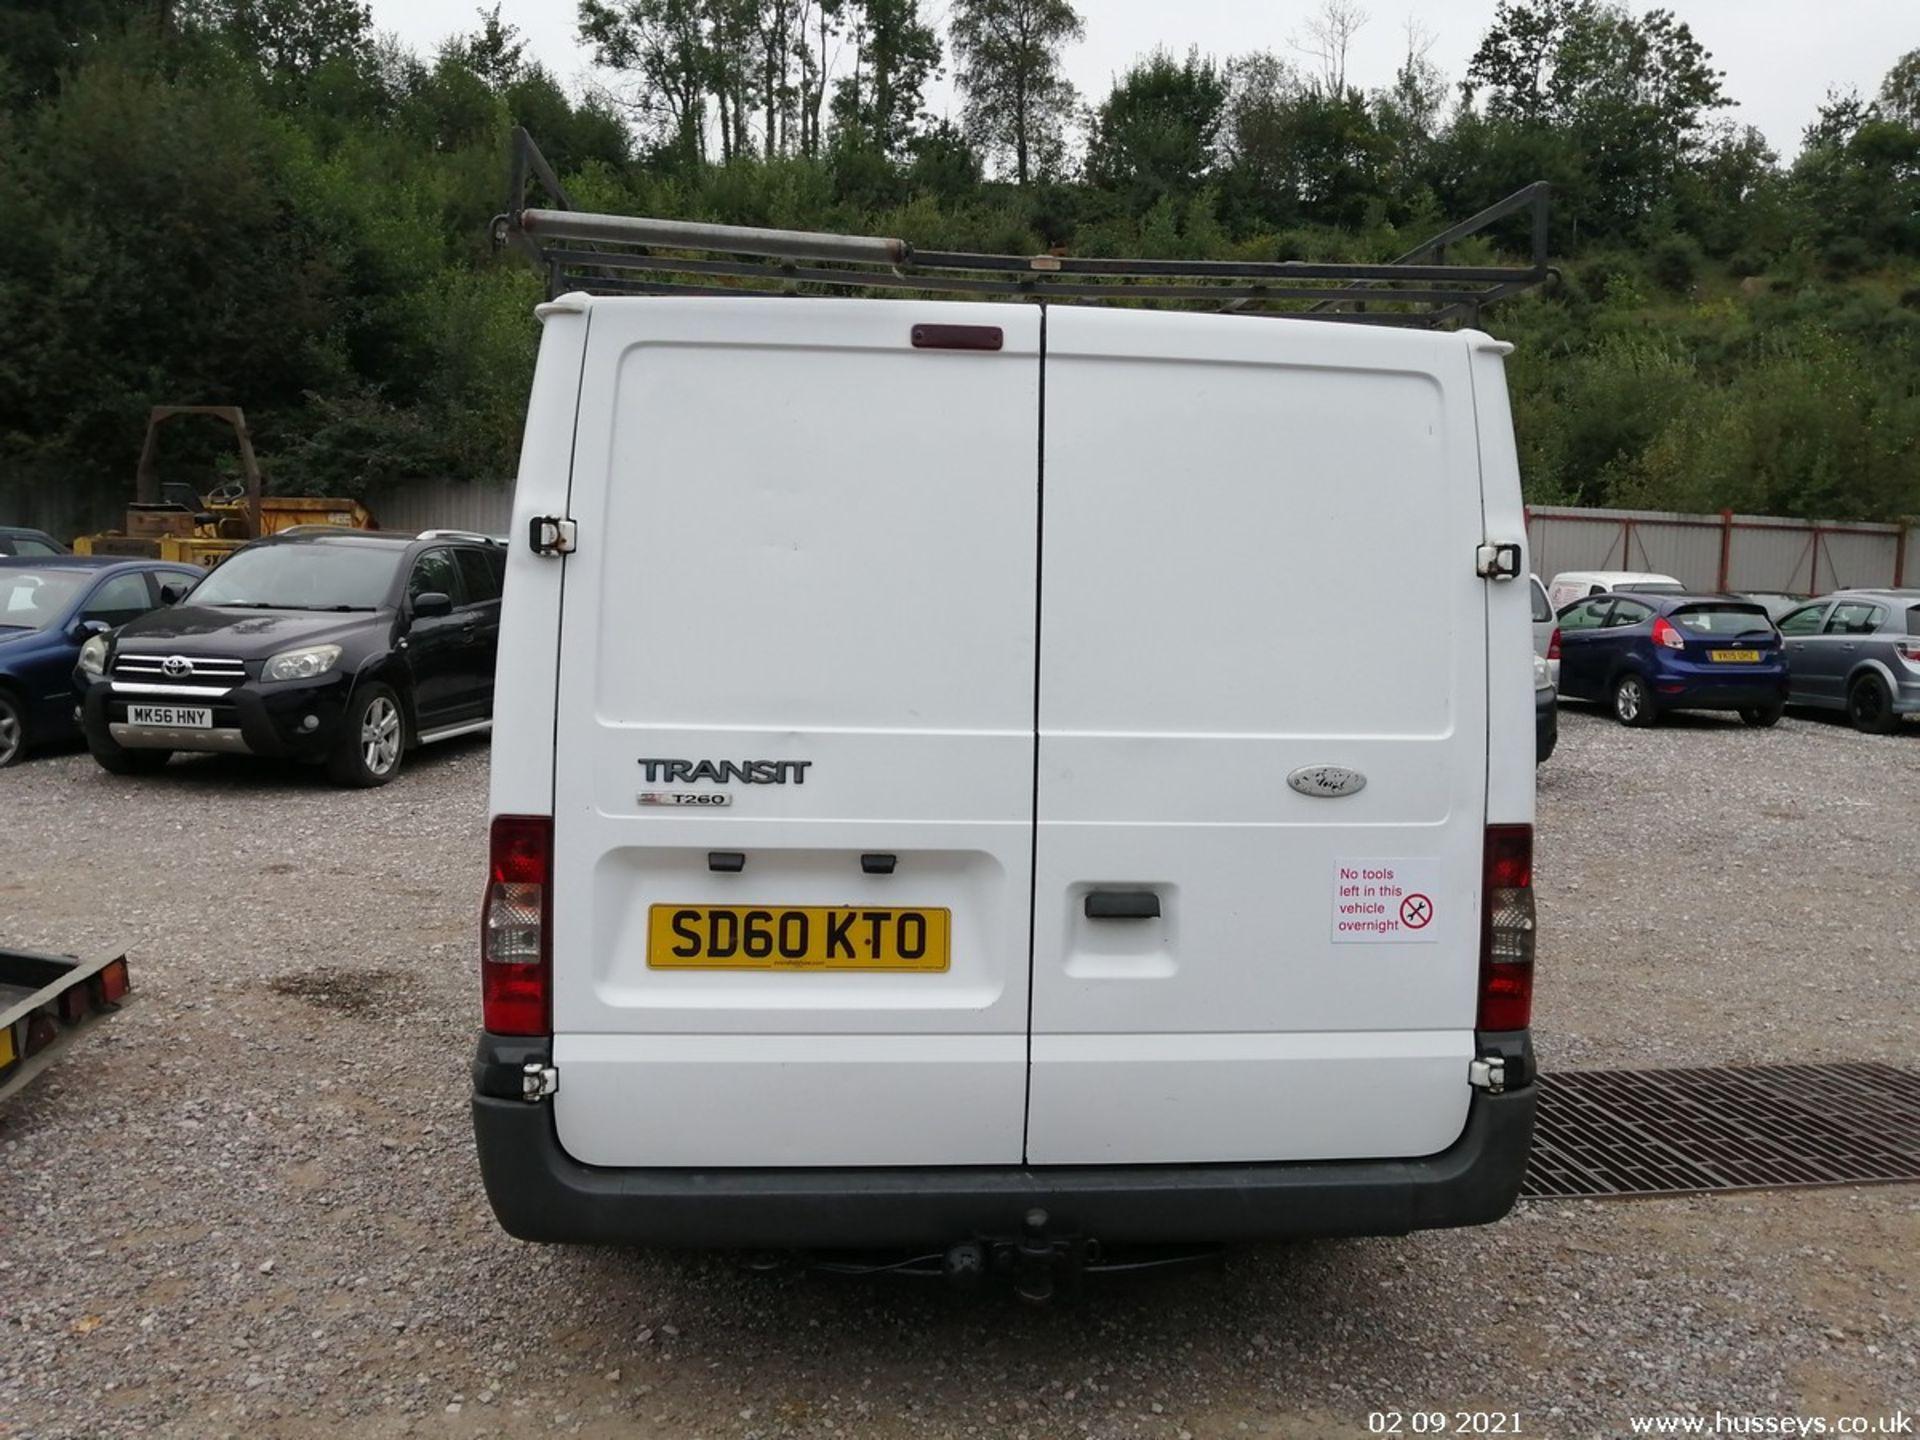 10/60 FORD TRANSIT 85 T260M FWD - 2198cc 5dr Van (White, 237k) - Image 12 of 23